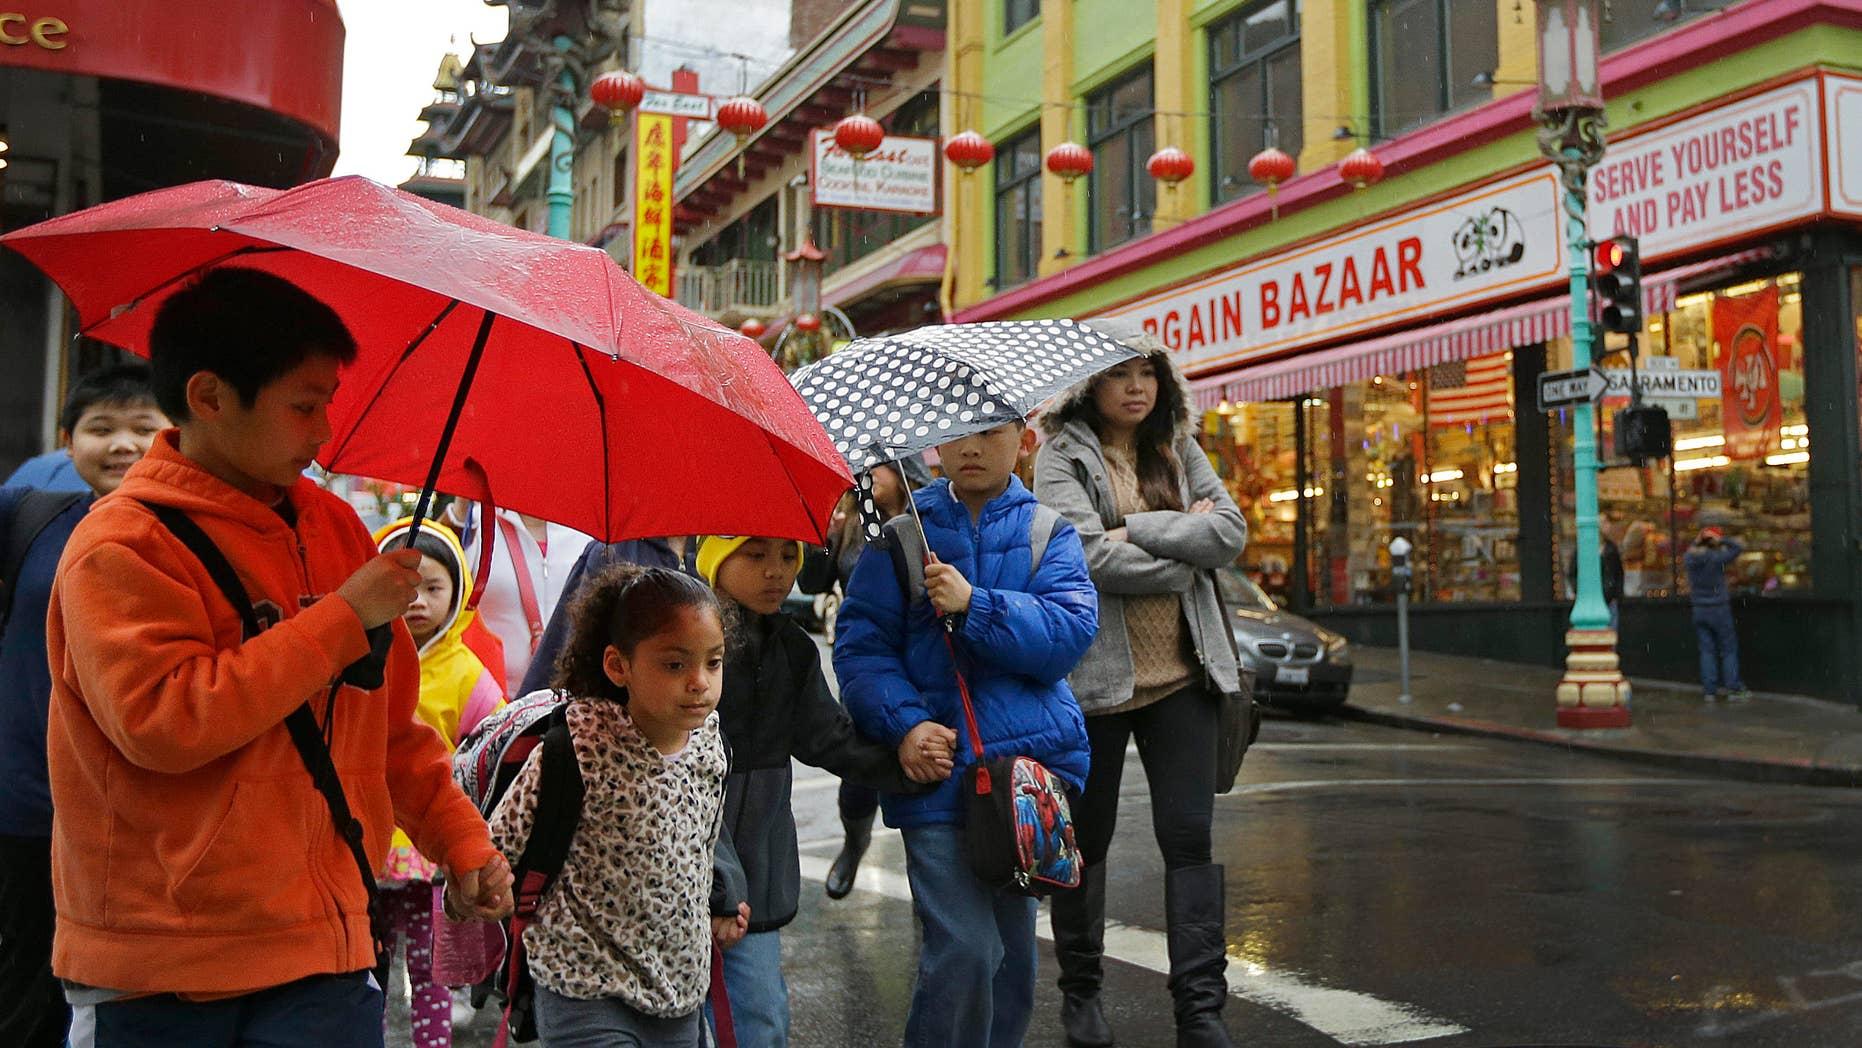 Feb. 6, 2015: Children from San Francisco Community School walk through Chinatown while on a field trip.